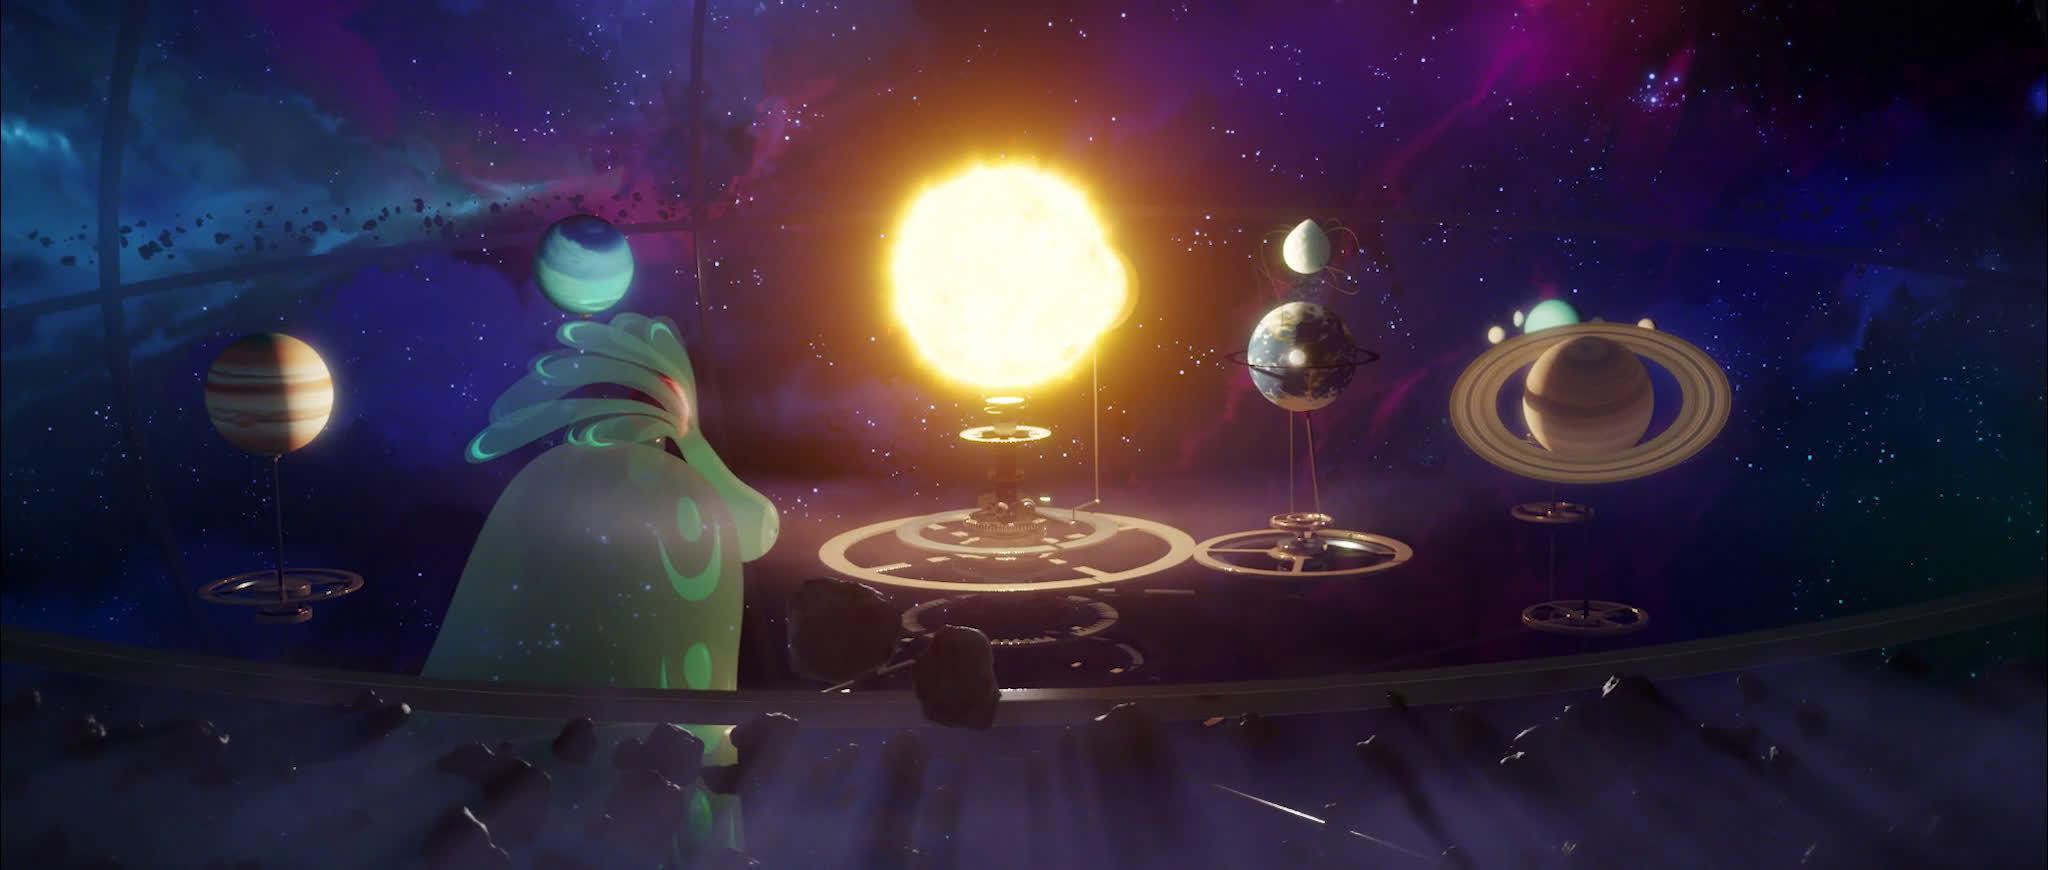 Planimation,制片公司Hornet制作的动画短片……